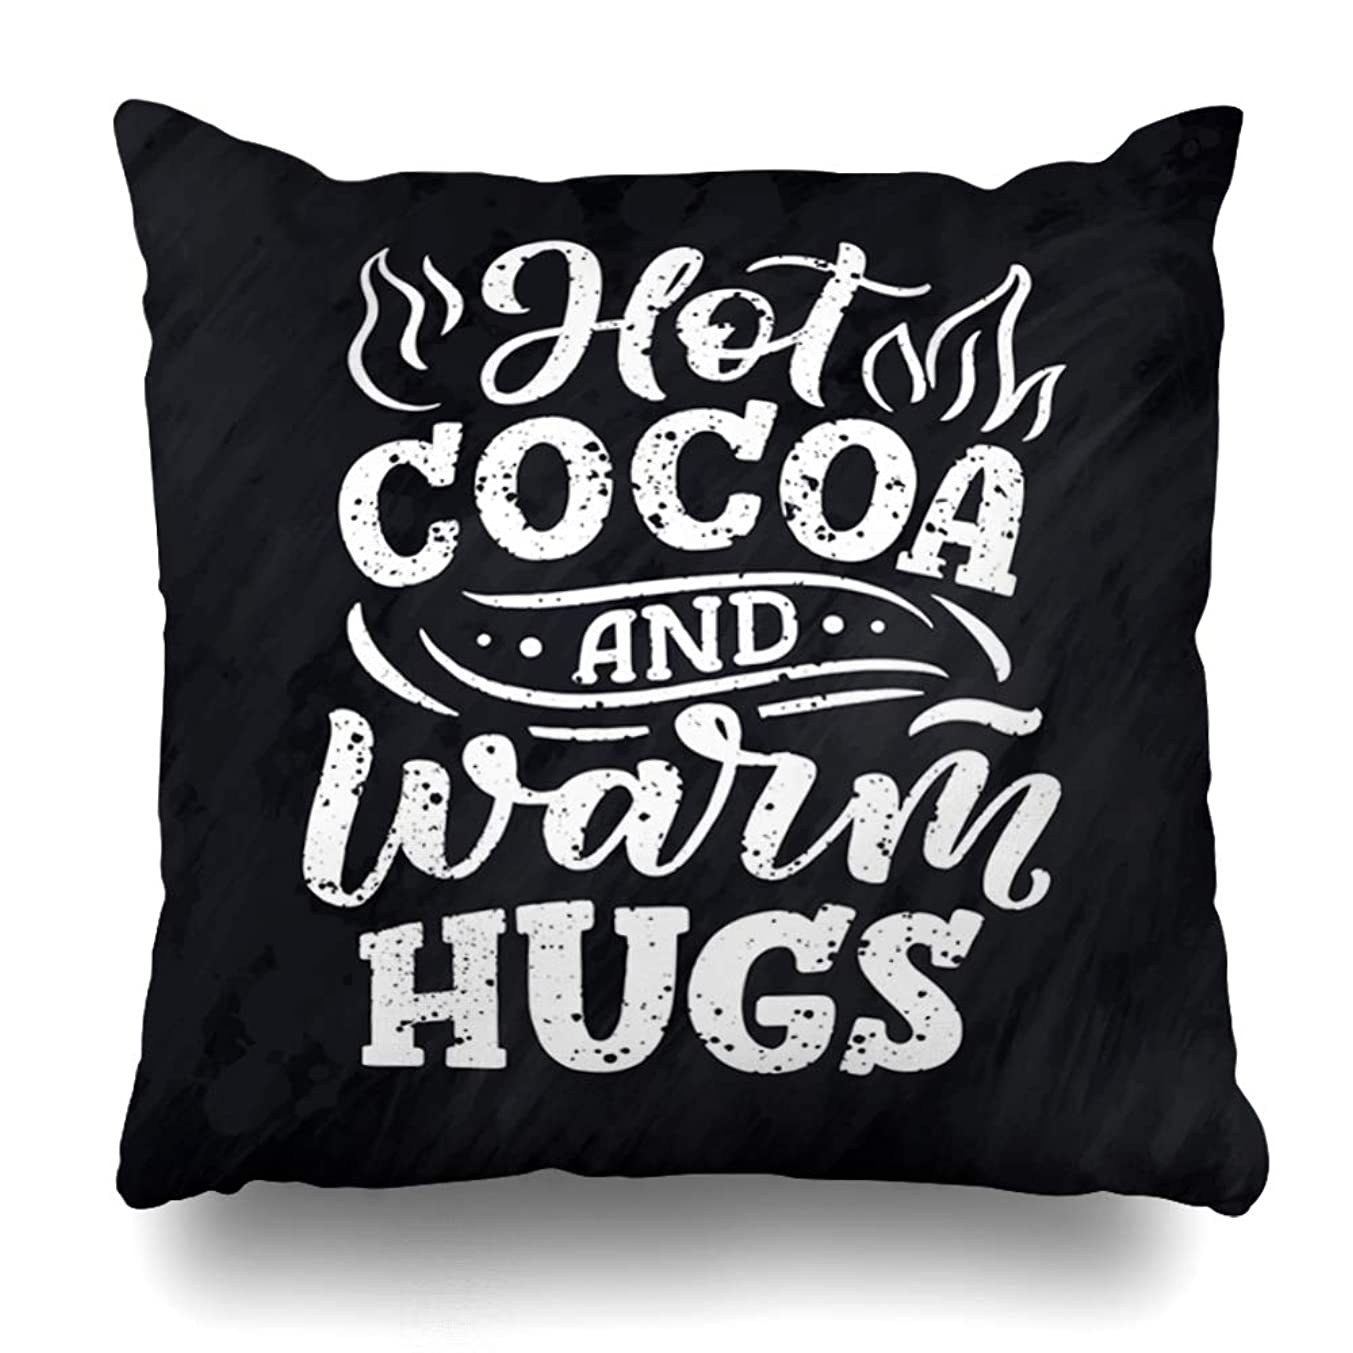 Ahawoso Throw Pillow Cover Square 20x20 Quote Autumn Hot Cocoa Hand Lettering Alphabet Latte Vintage Black Cacao Cafe Chalk Design Home Decor Cushion Case Pillowcase